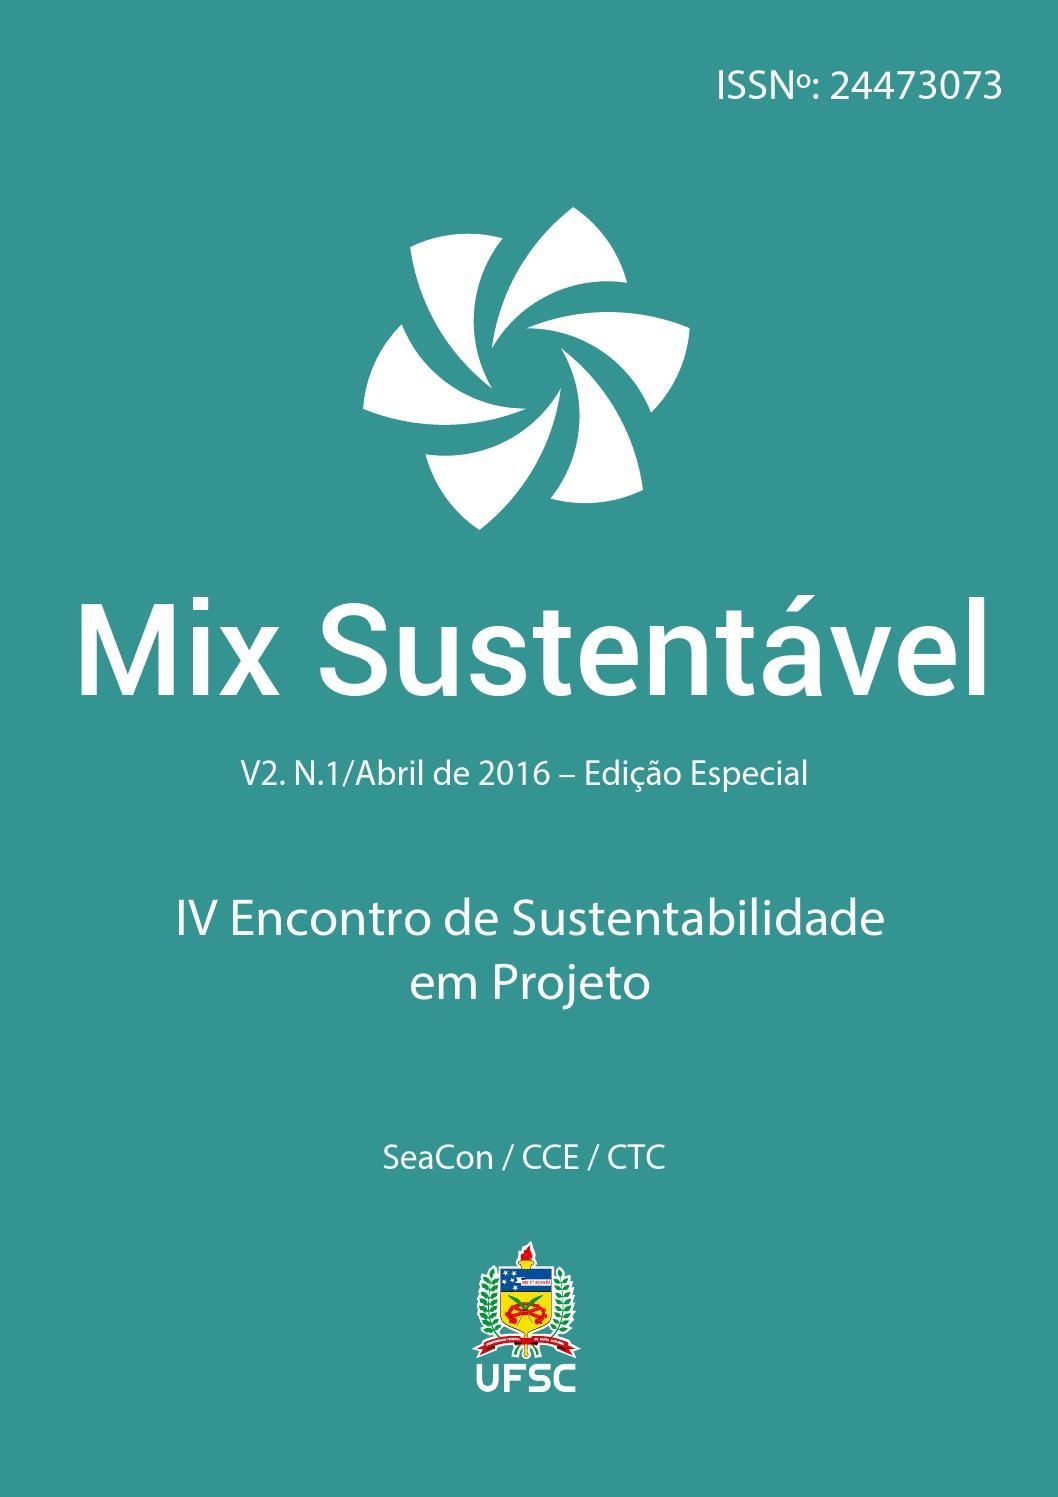 Mix sustentvel edio especial by luan jacob gonzatti issuu fandeluxe Choice Image